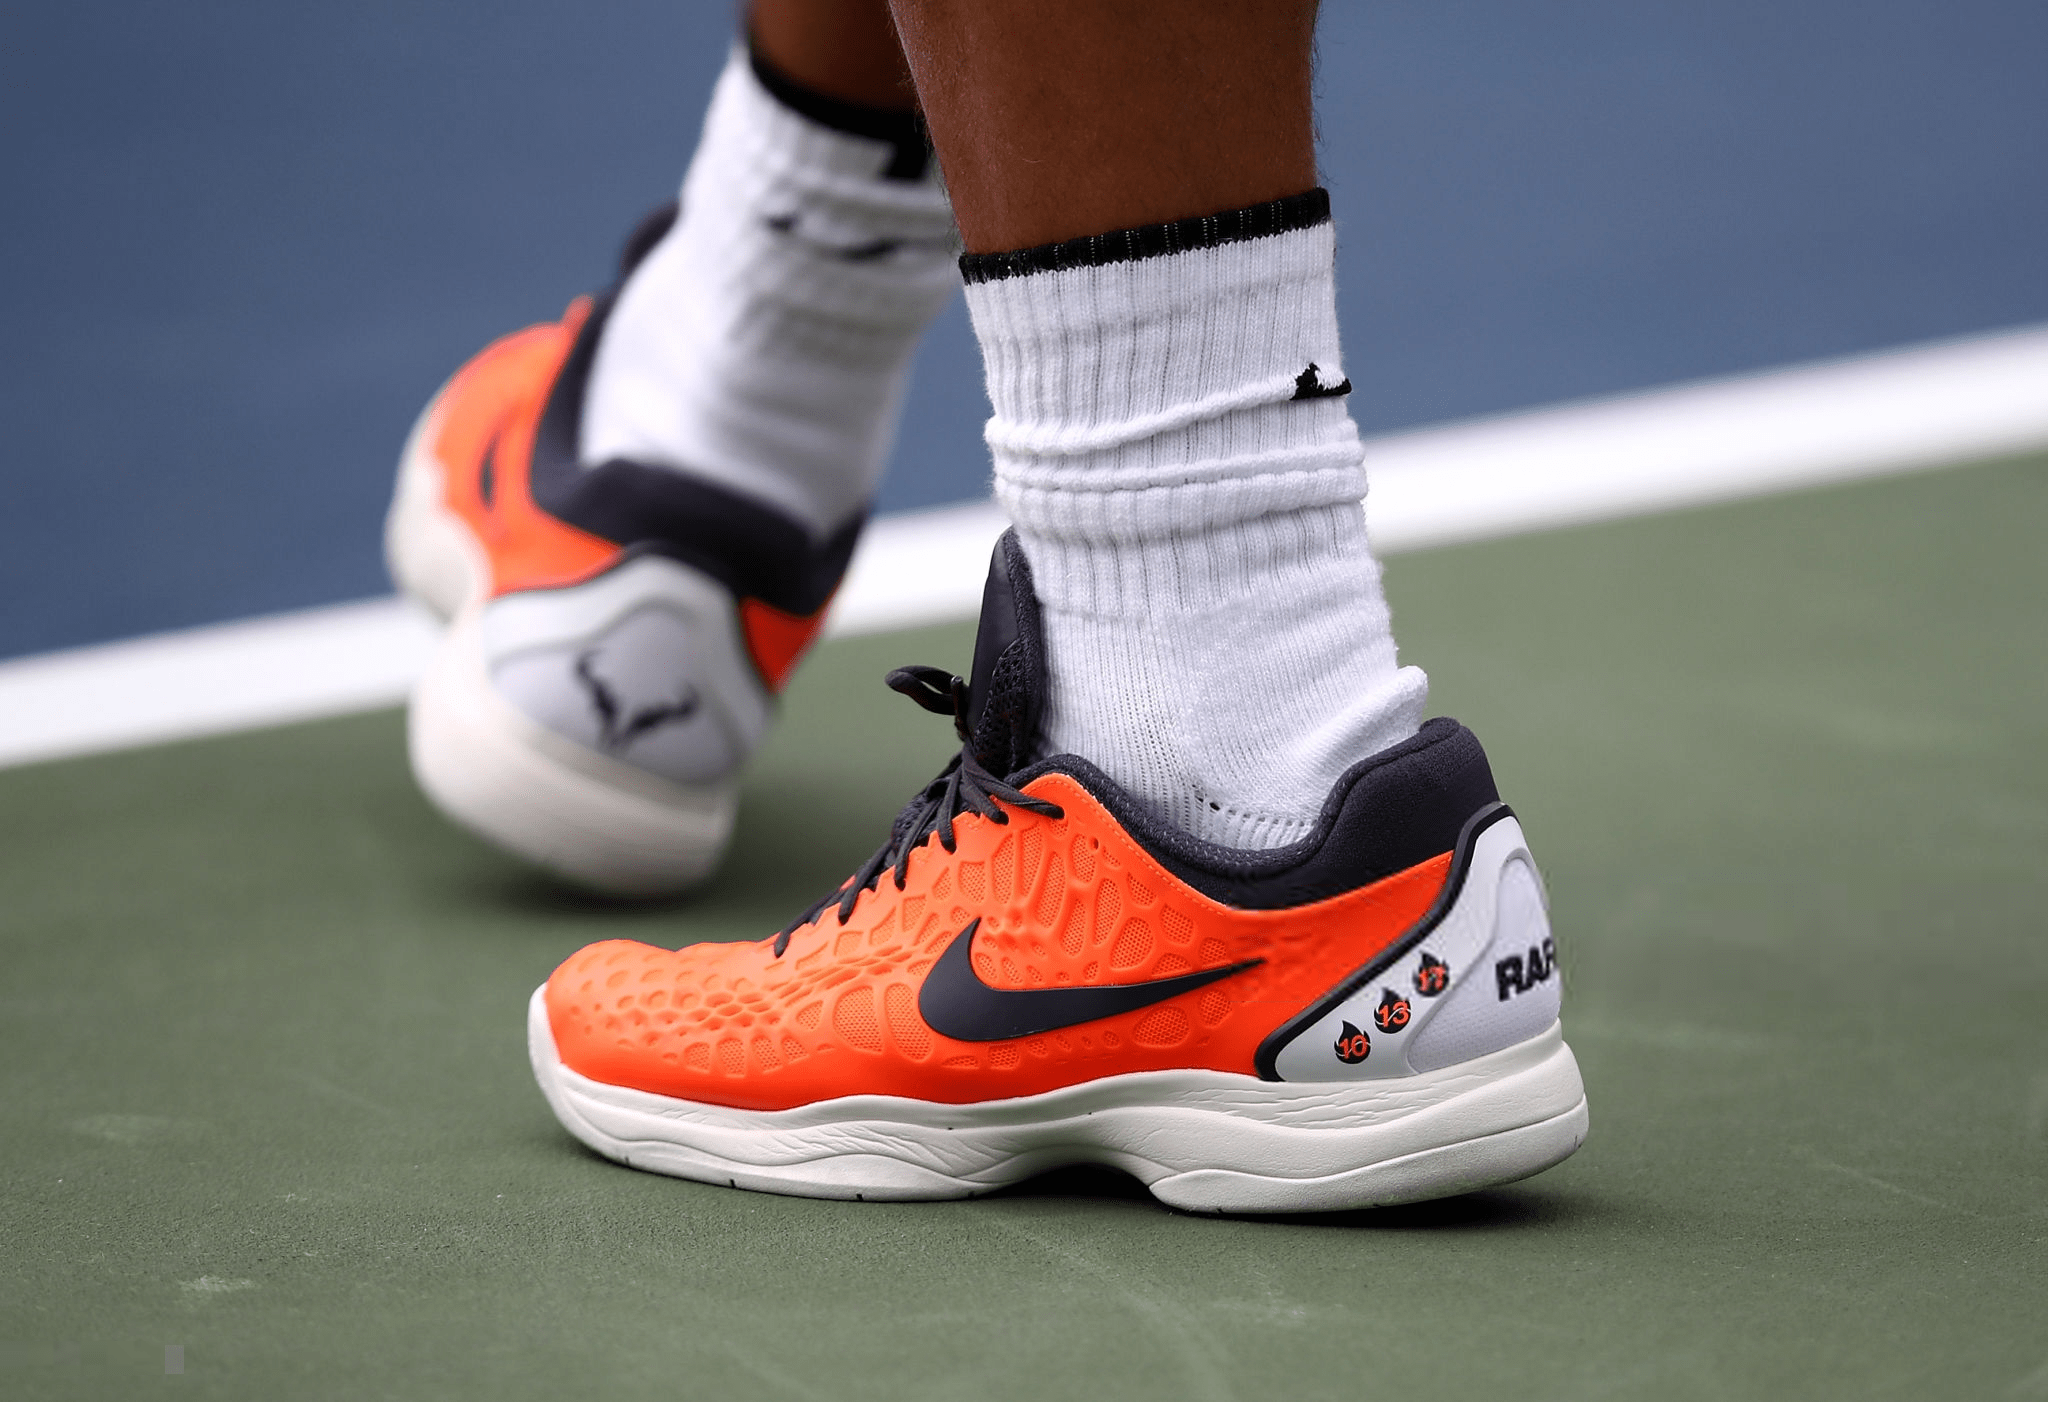 Rafael Nadal 2018 Us Open Nike Shoes Rafael Nadal Fans